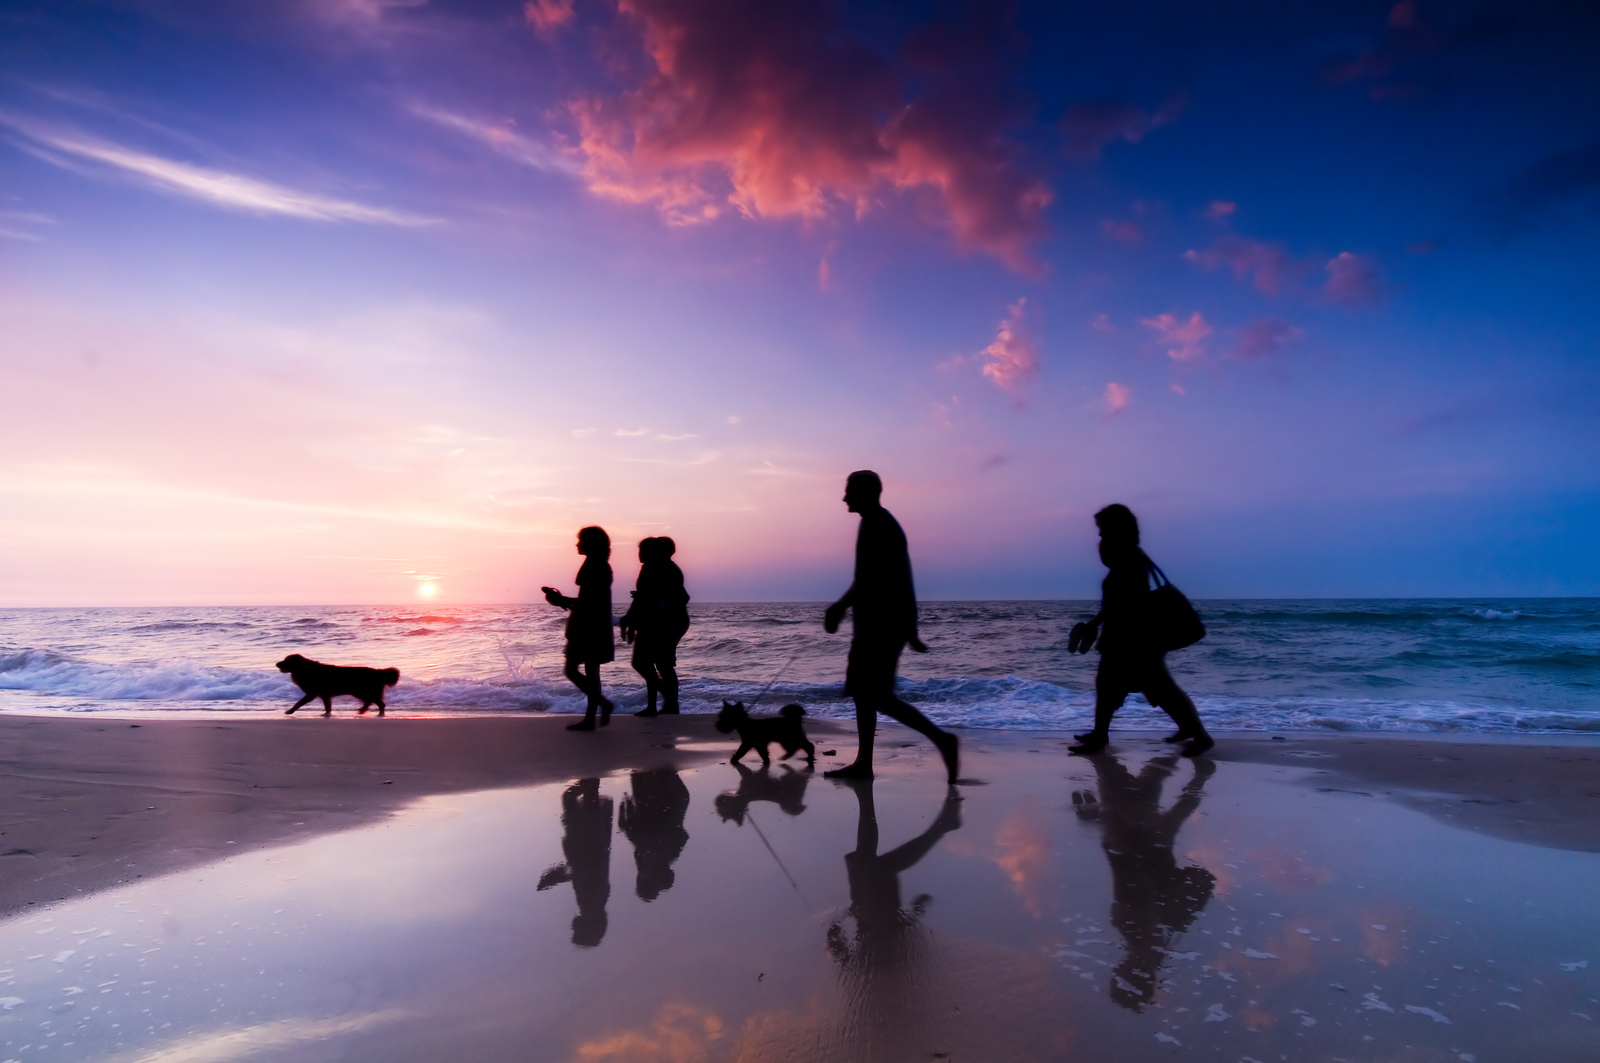 bigstock-Family-walk-on-the-beach-at-su-18950786.jpg